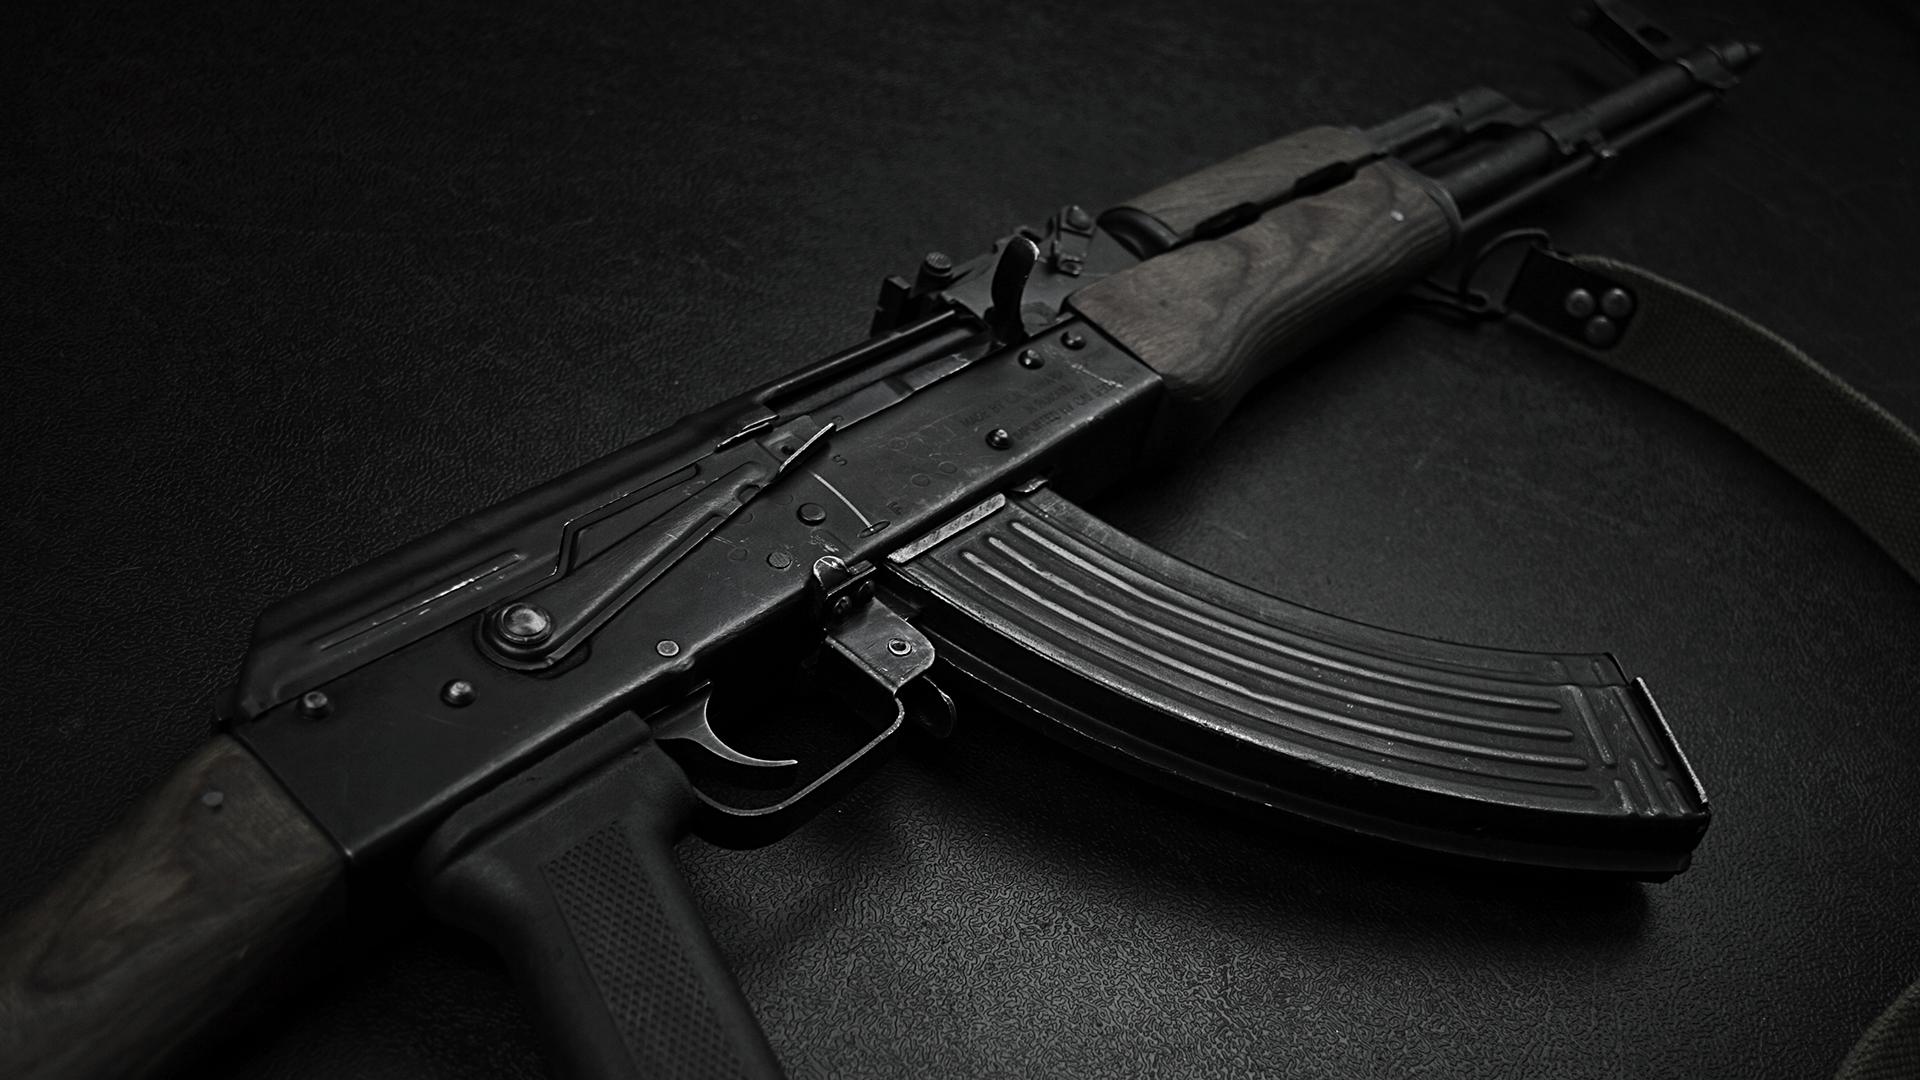 Fondos De Pantalla Kalashnikov Ak 47 Rifles Unión